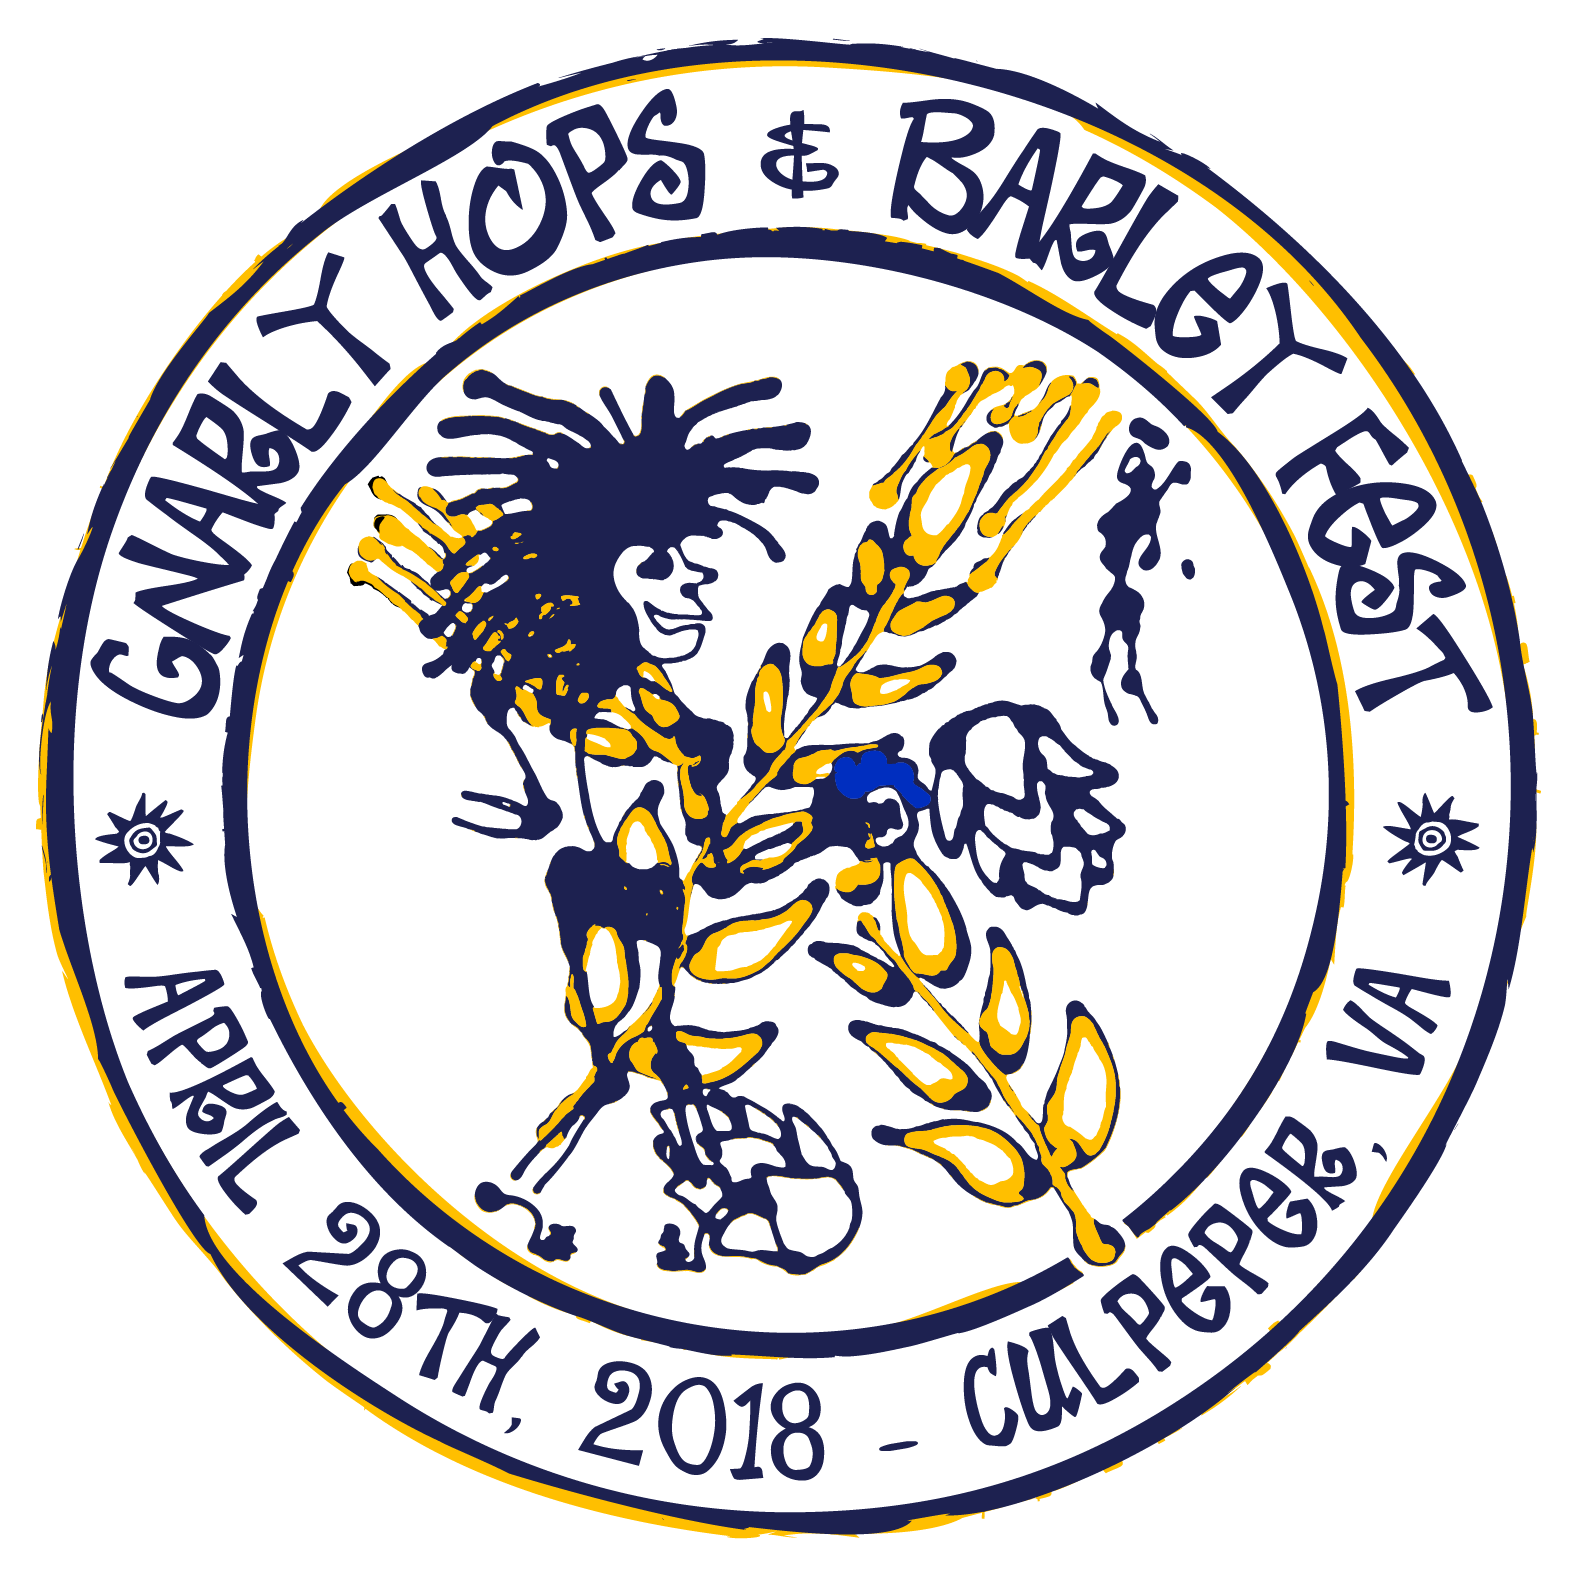 Hops clipart barley. Gnarly fest sixth annual